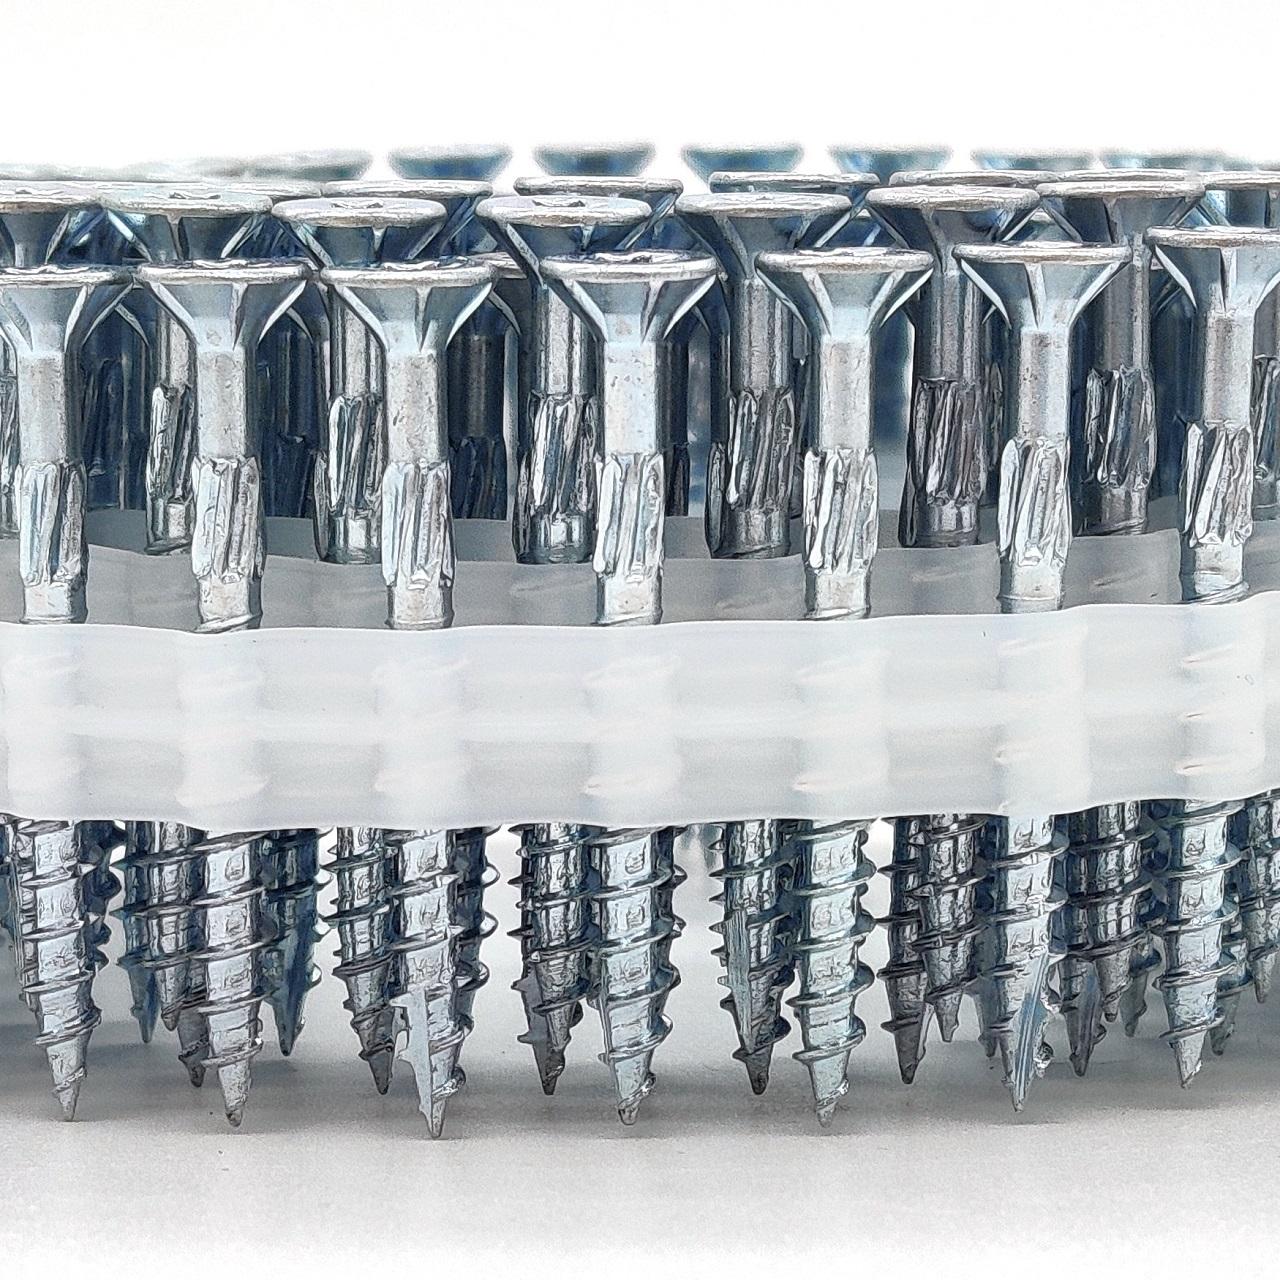 Coil adunox-SuperUni Holzschrauben / Spanplattenschrauben   hell verzinkt   4,0x30